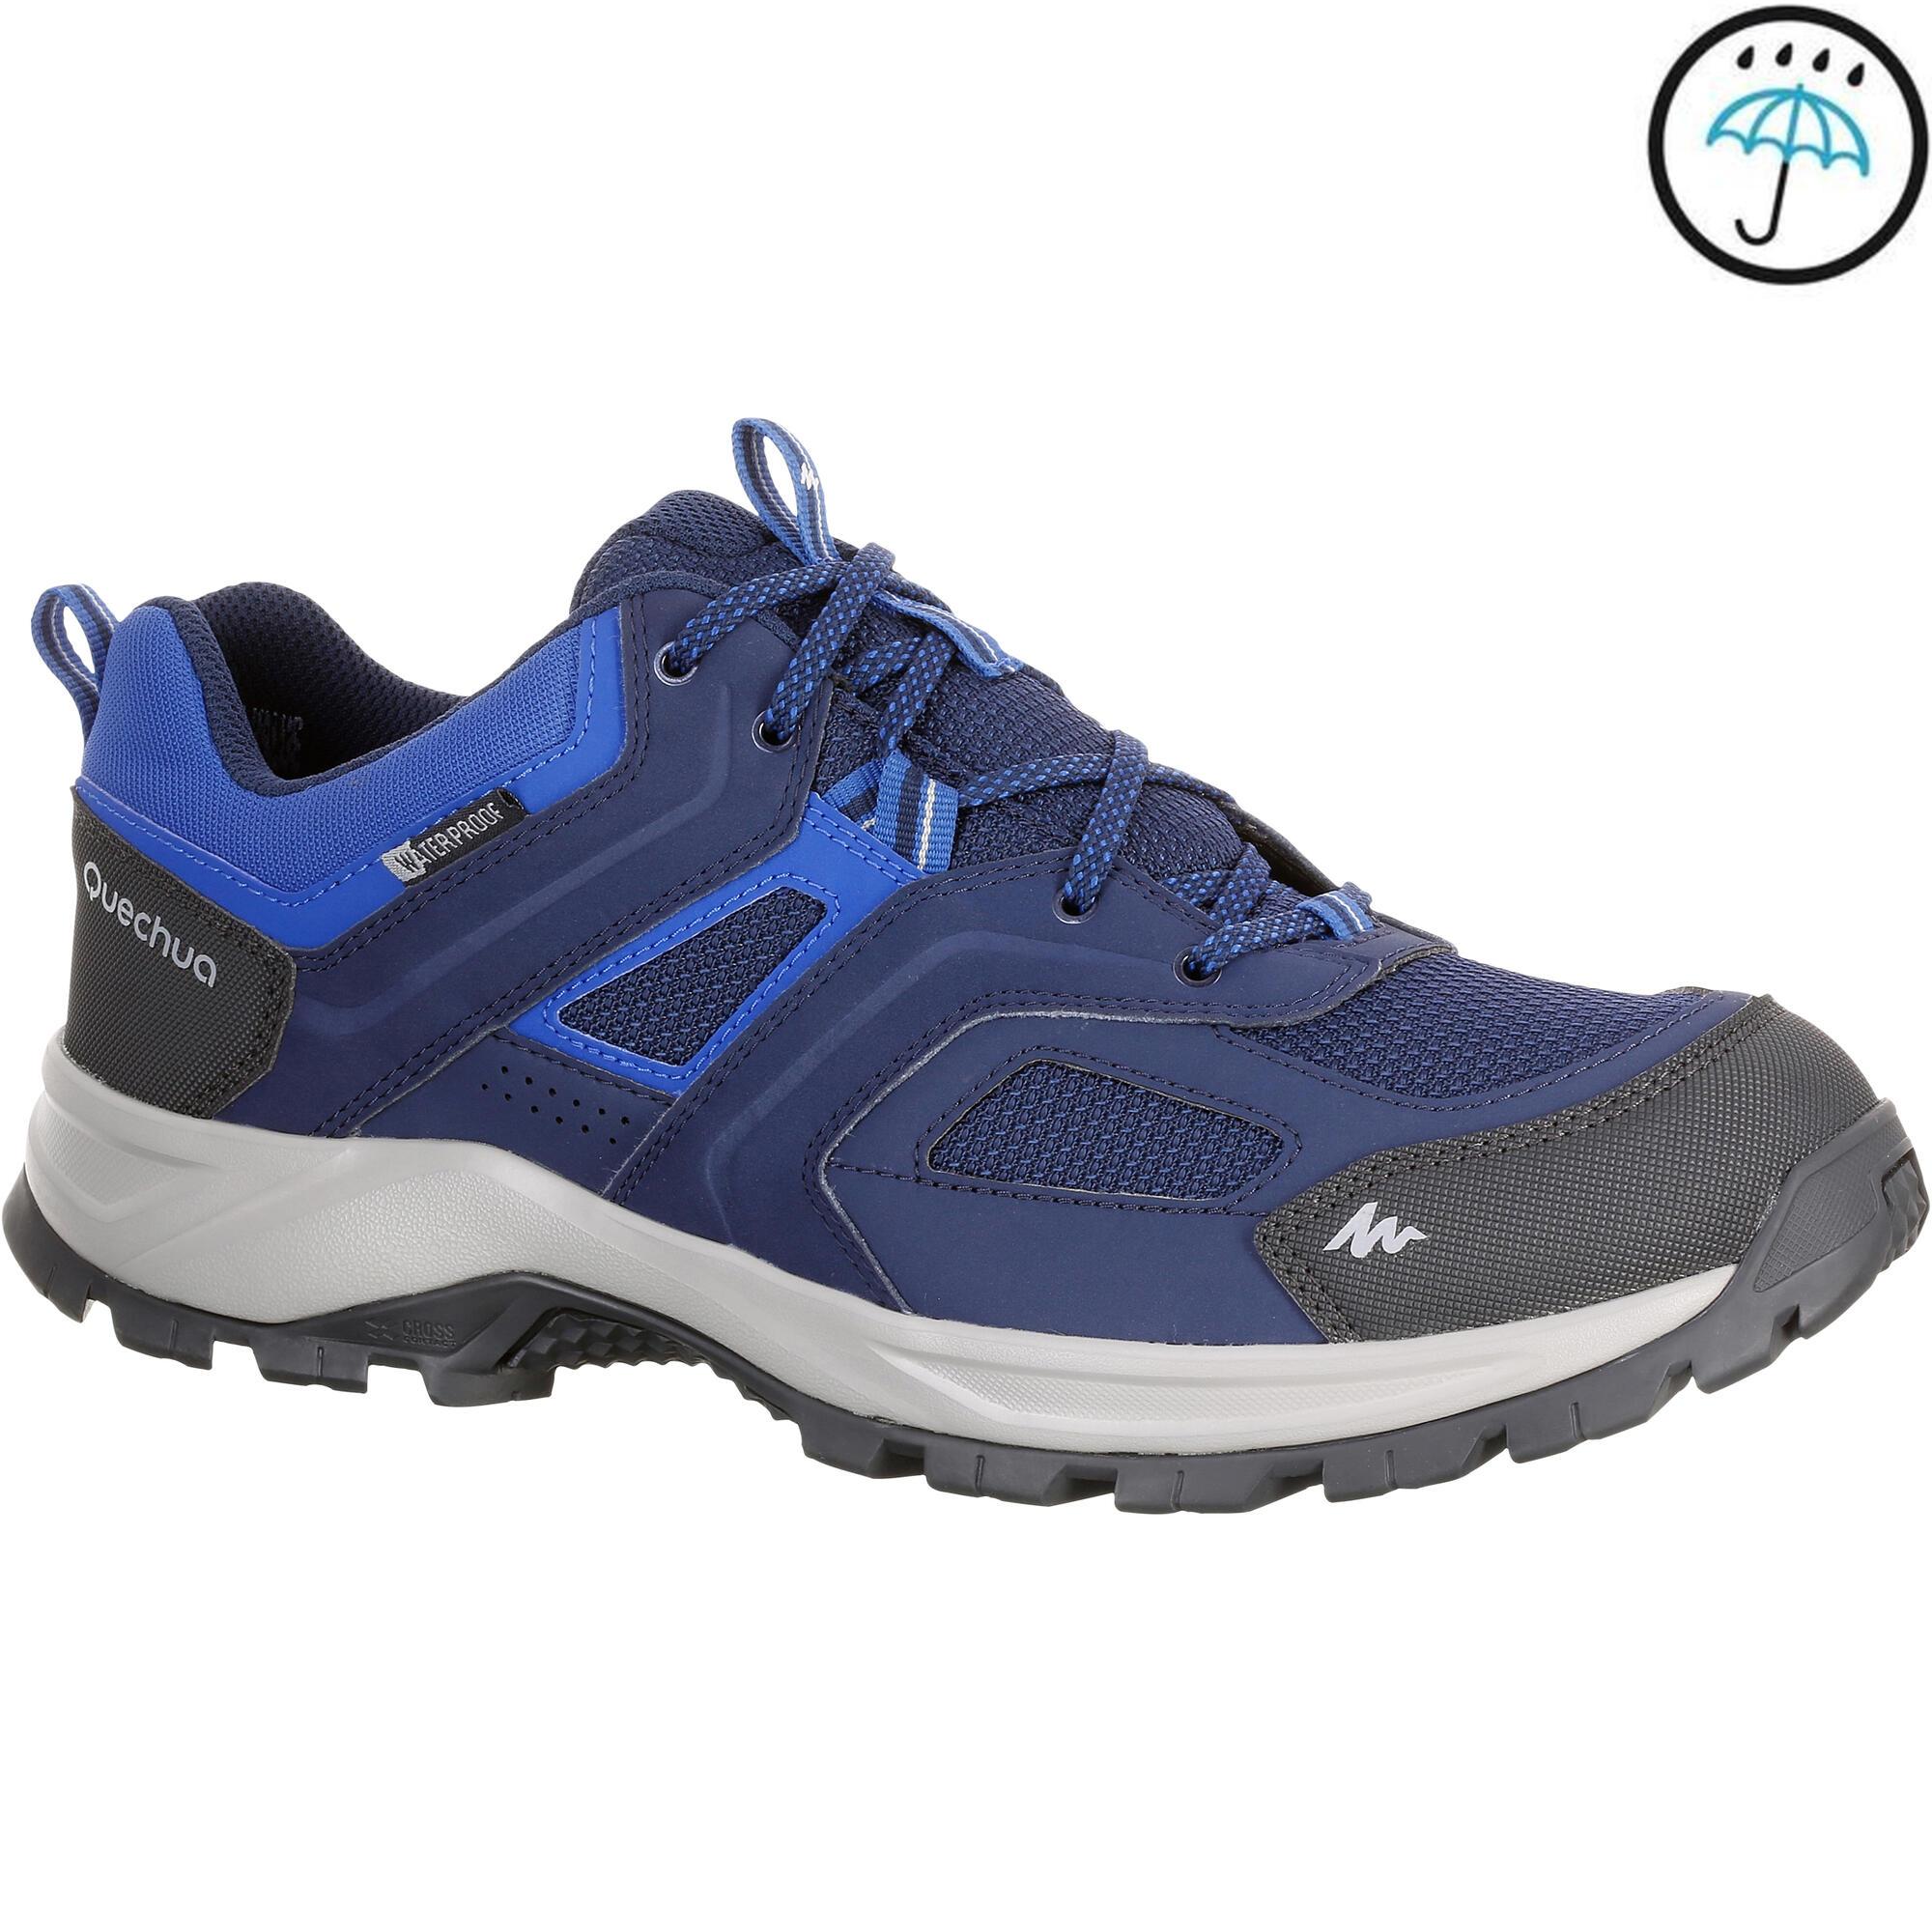 Homme Etanche Chaussures Marche Chaussure field De Homme N8nwOvm0